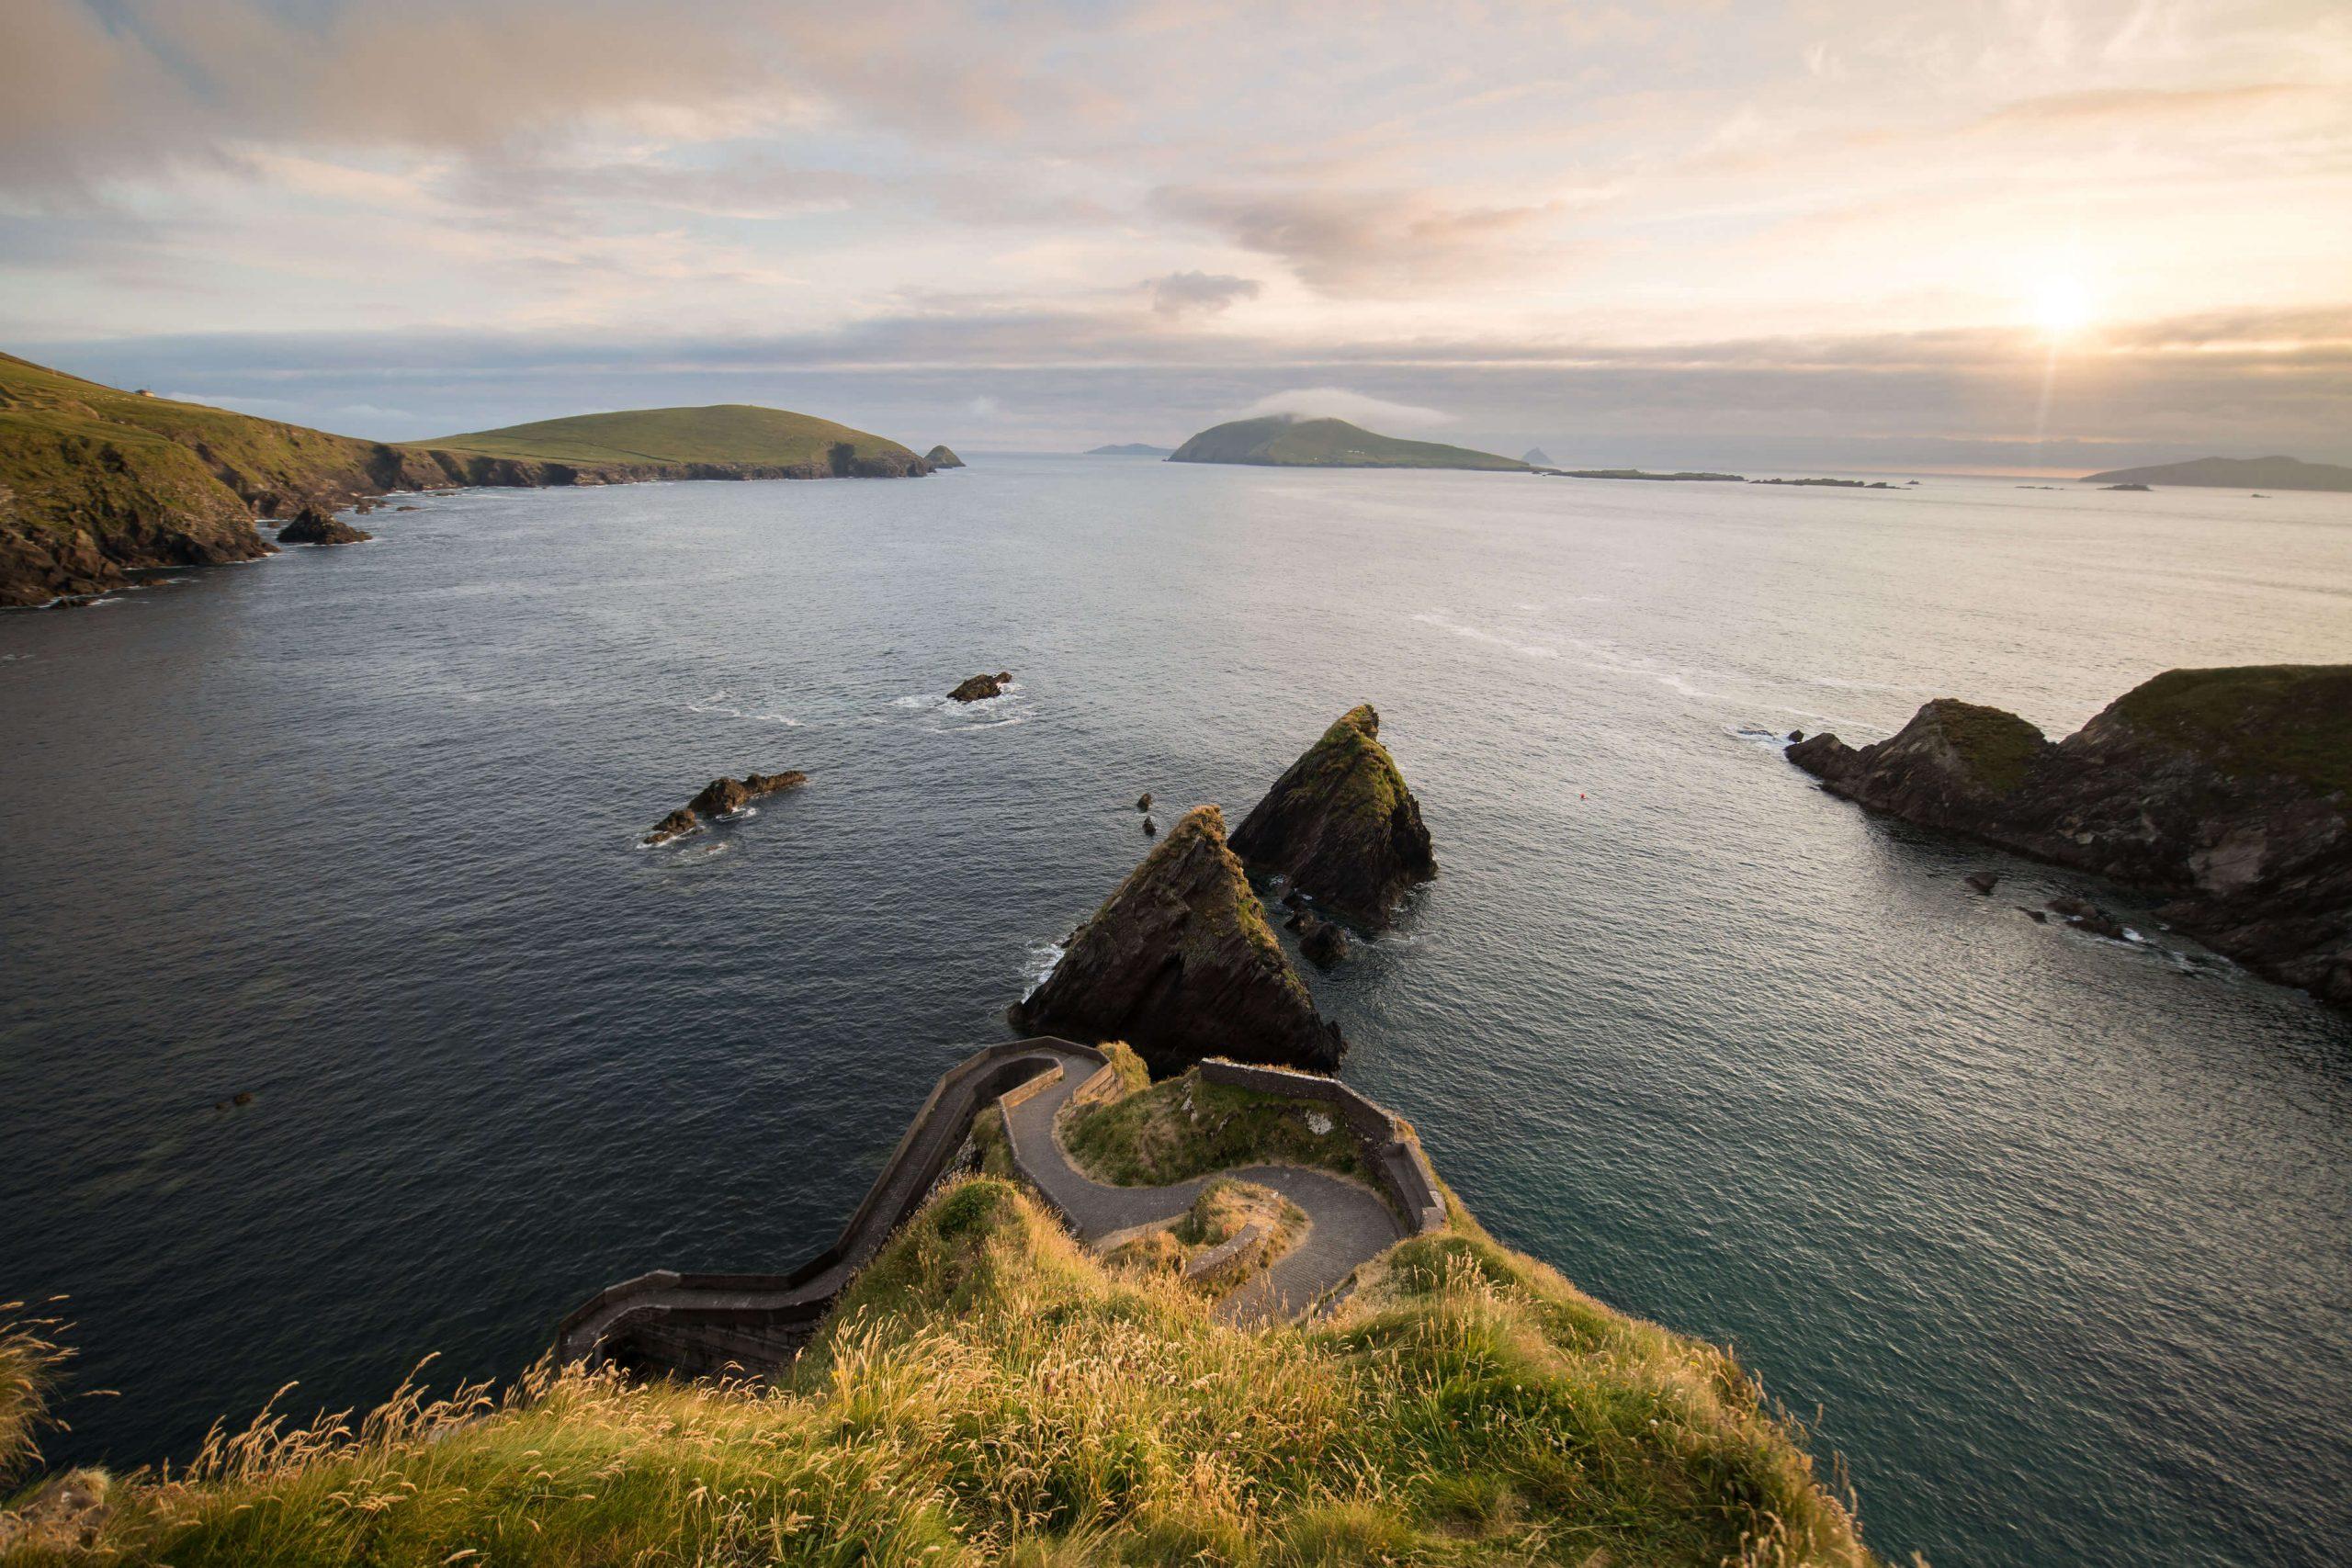 Dunquin Harbour, County Kerry, Dingle Peninsula, Wild Atlantic Way